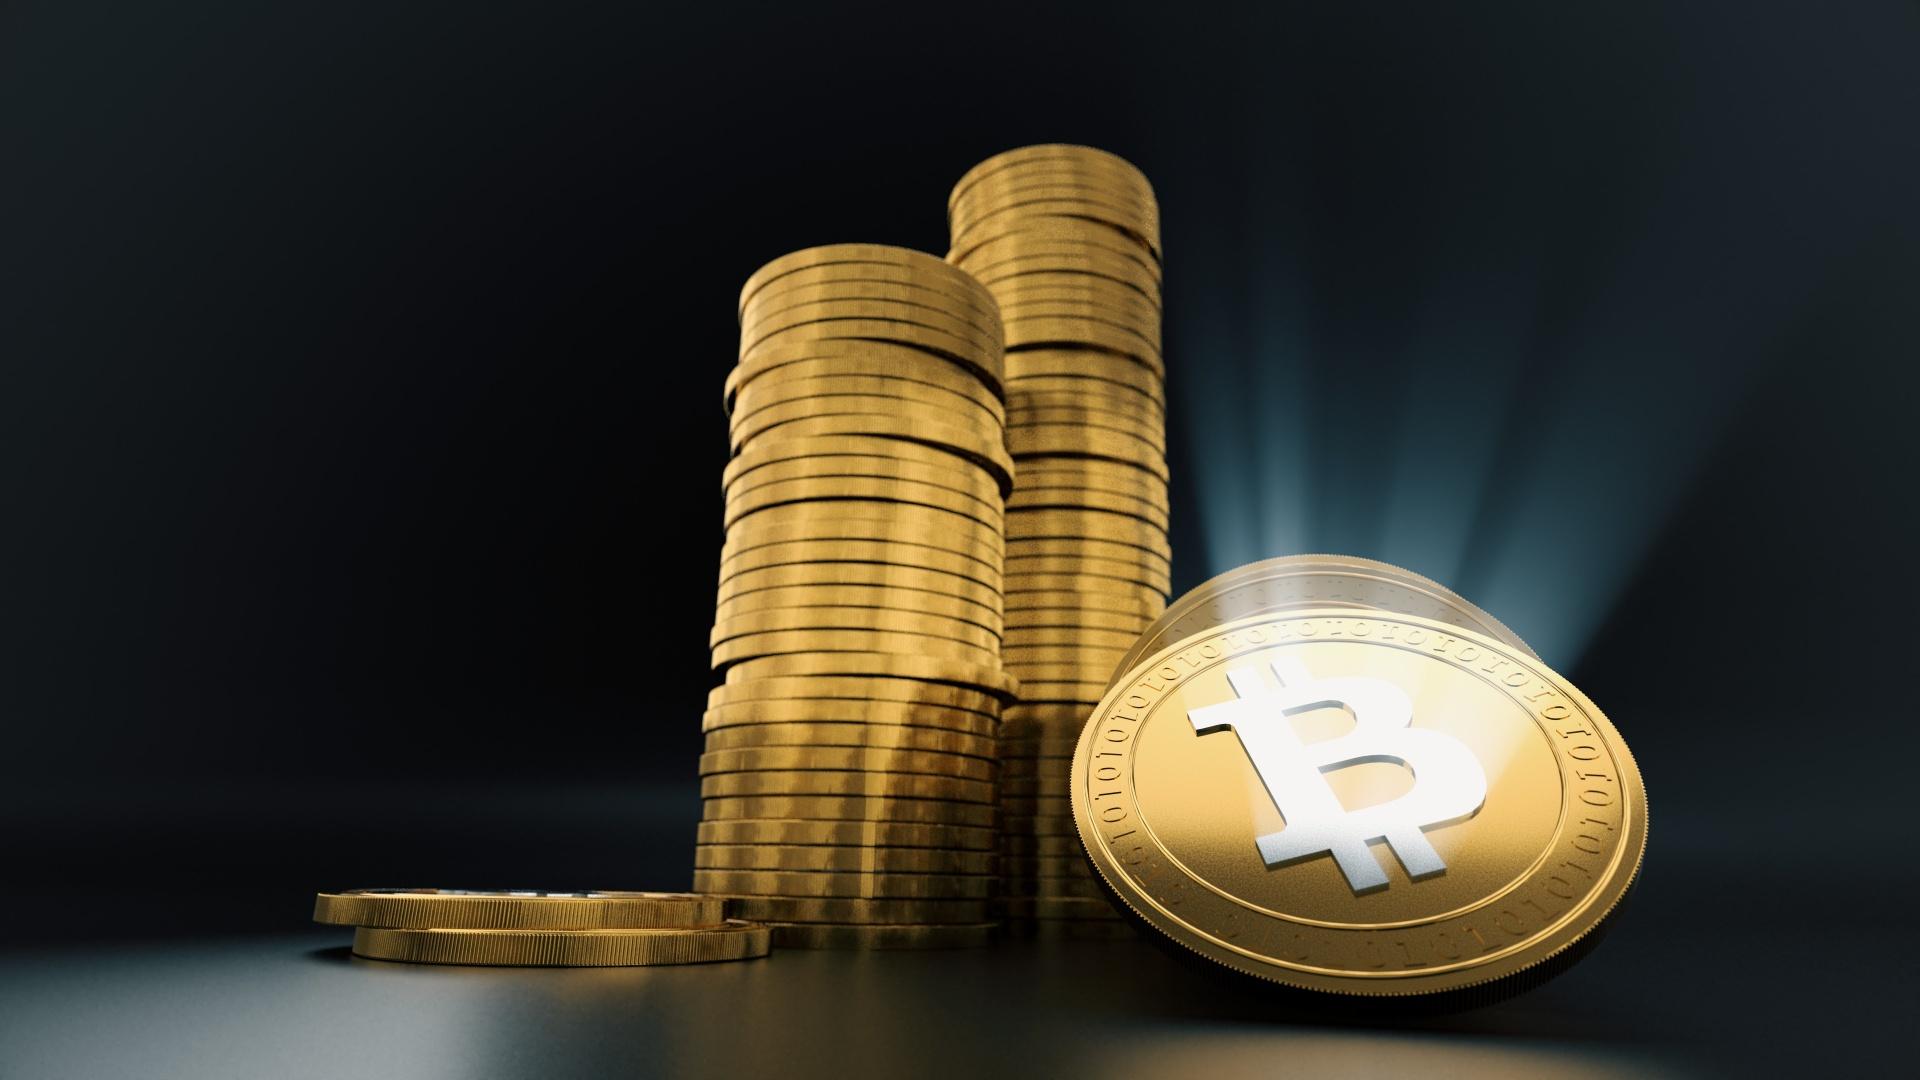 budućnost kriptovaluta najbolji kripto altcoin za ulaganje